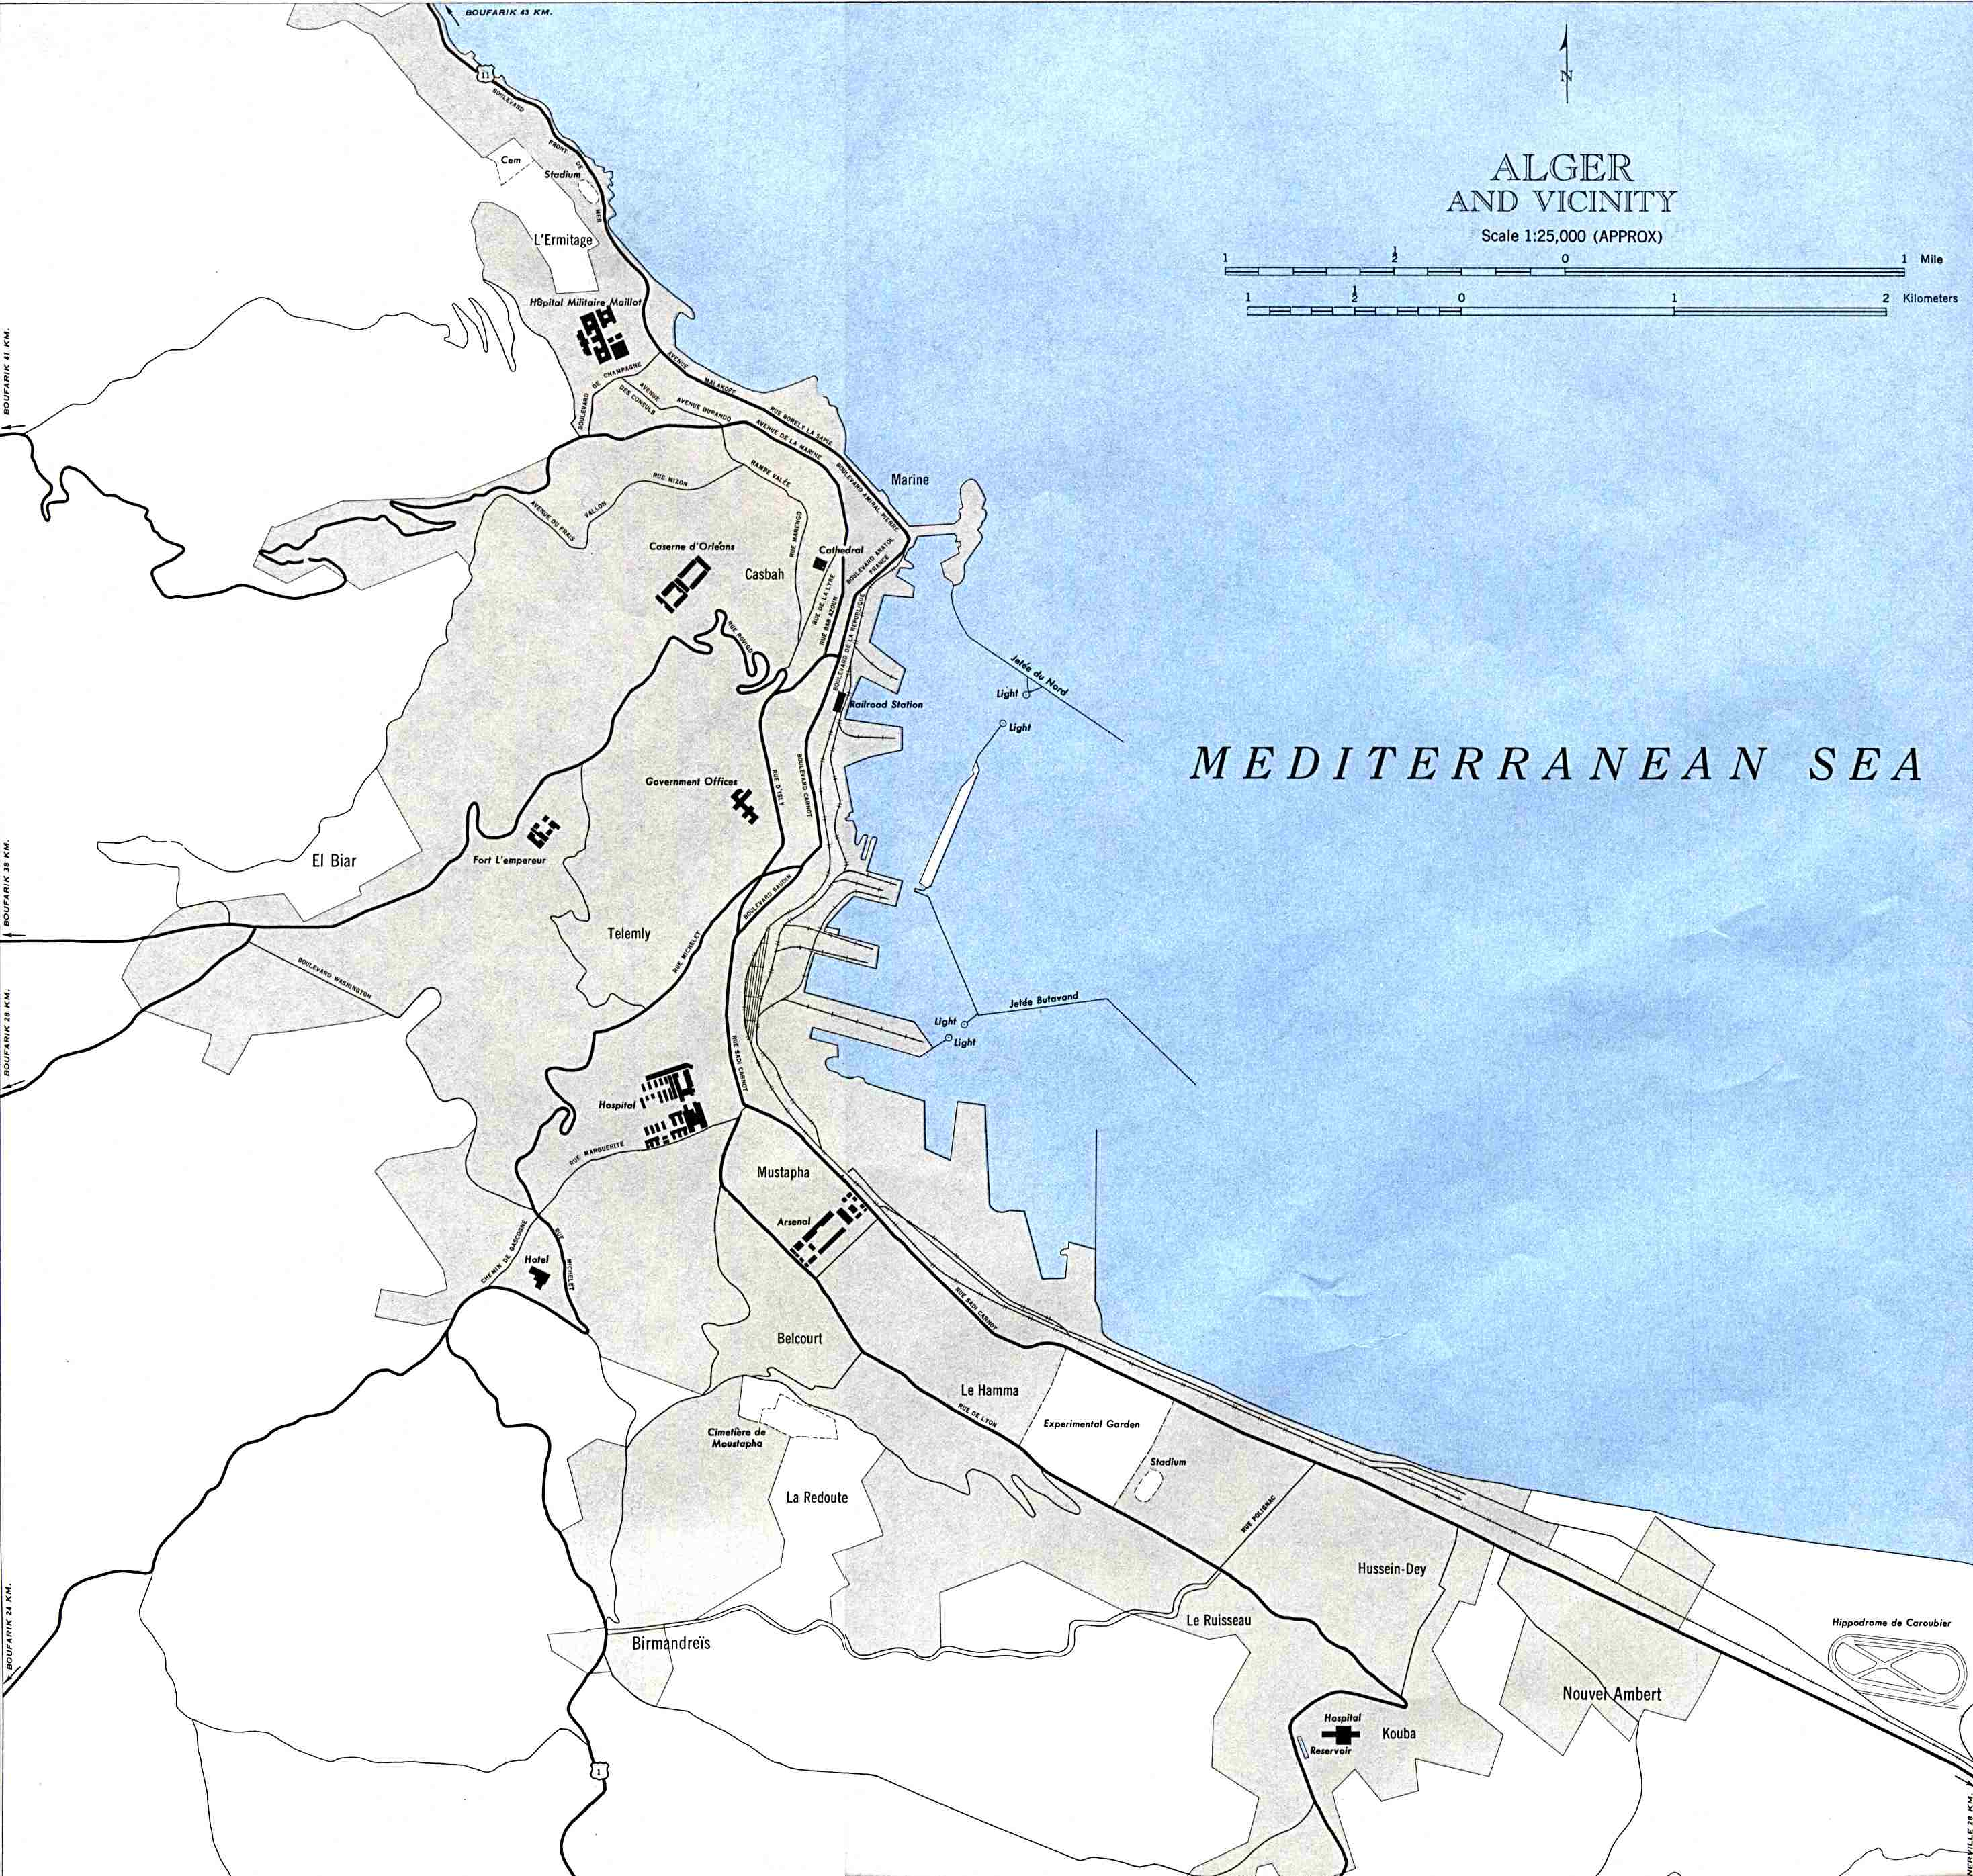 Carte Alger Dwg.Free Download Algeria Maps